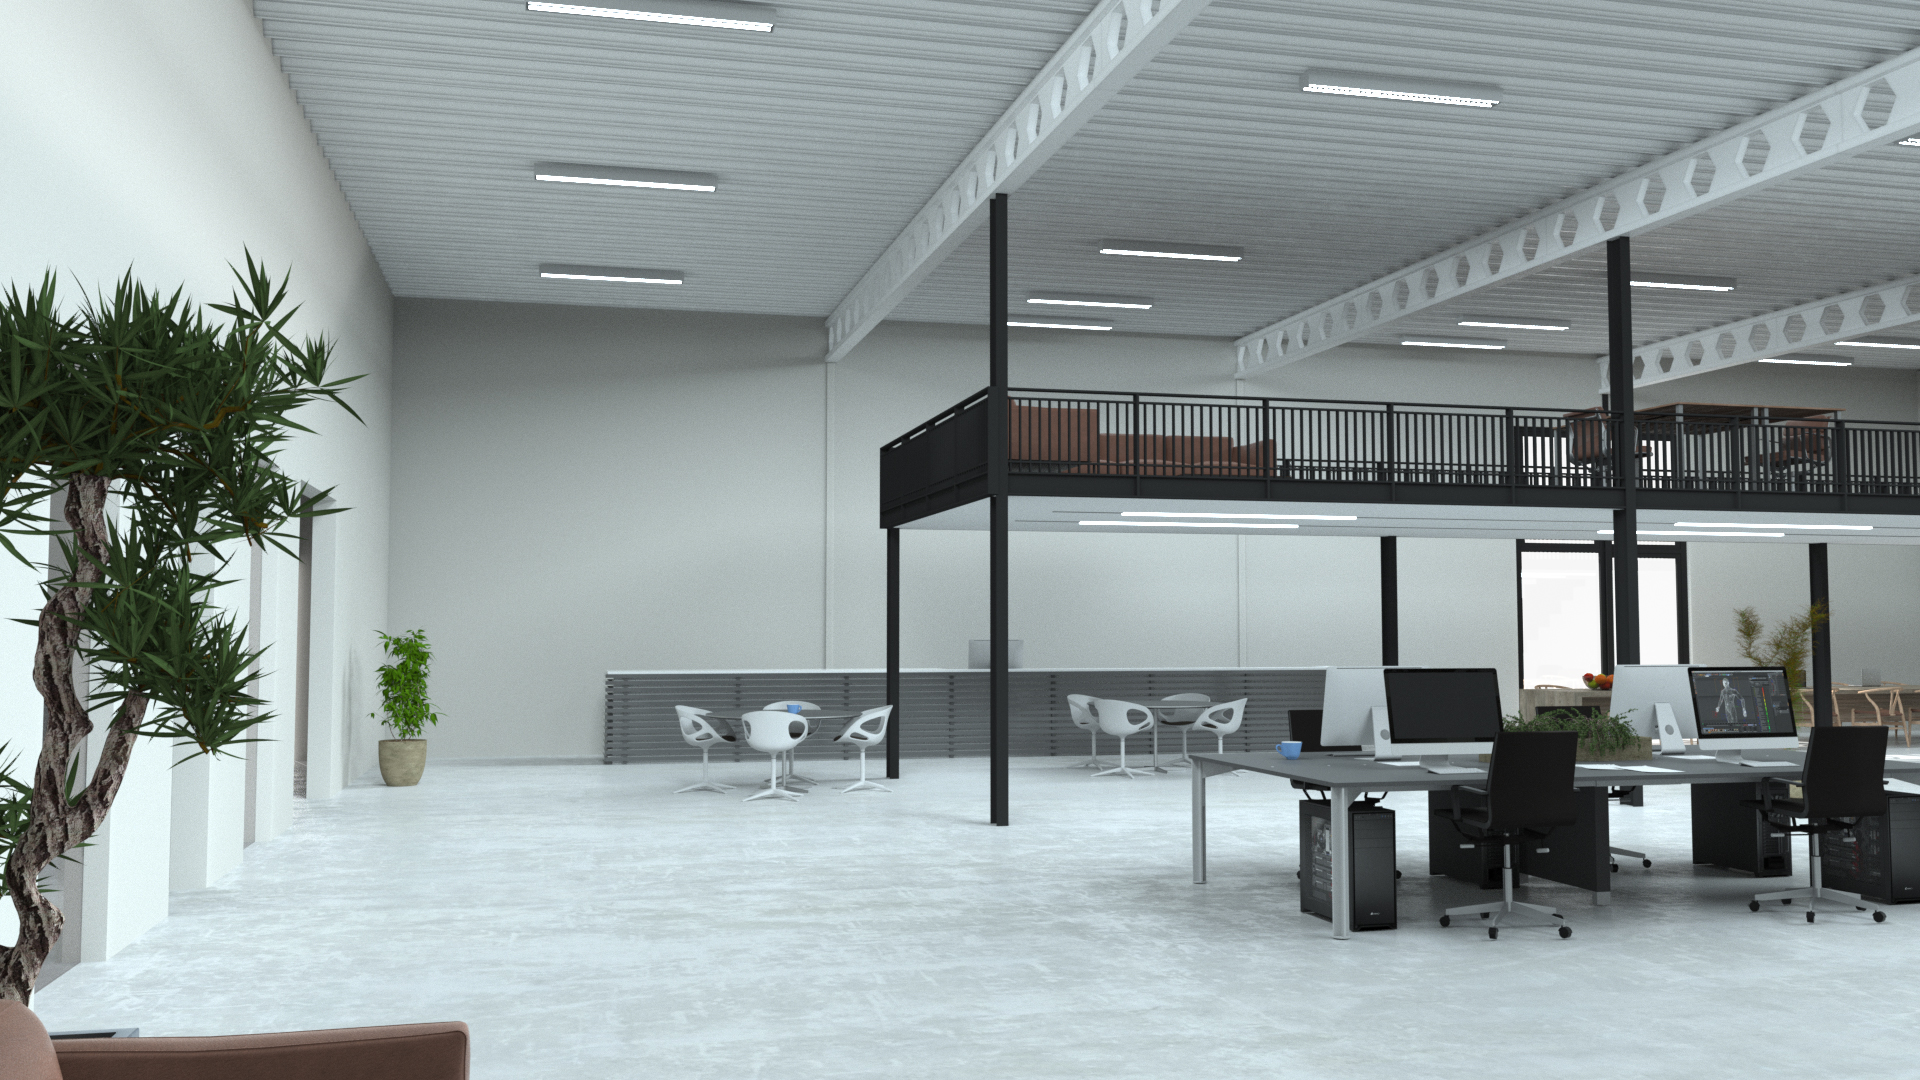 Hal_atelier_kantoor_optie2_00005.jpg